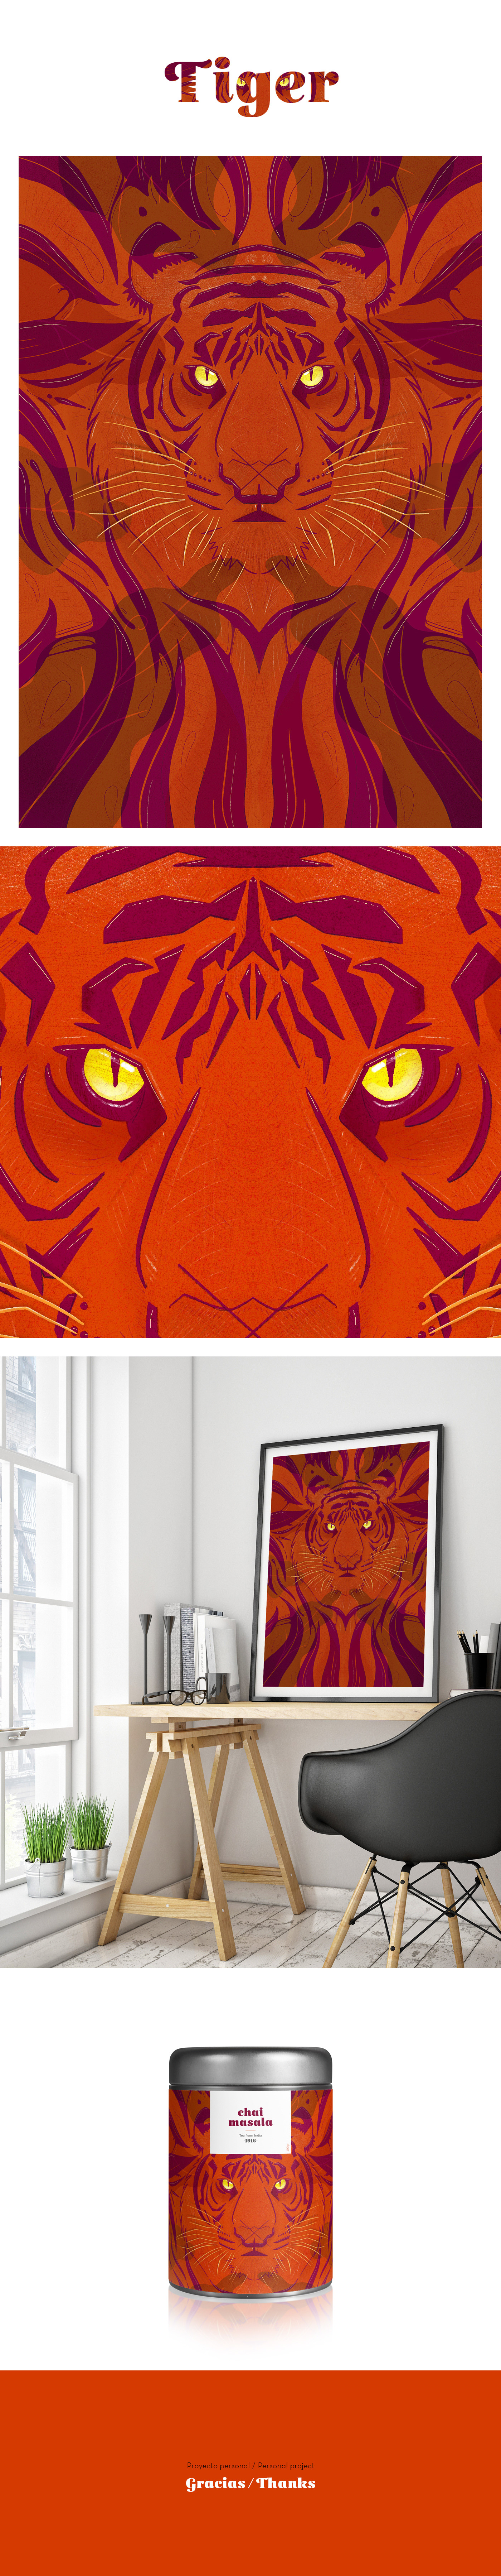 tigre simetria poster print ilustracion ILLUSTRATION  ipadpro applepencil Procreate